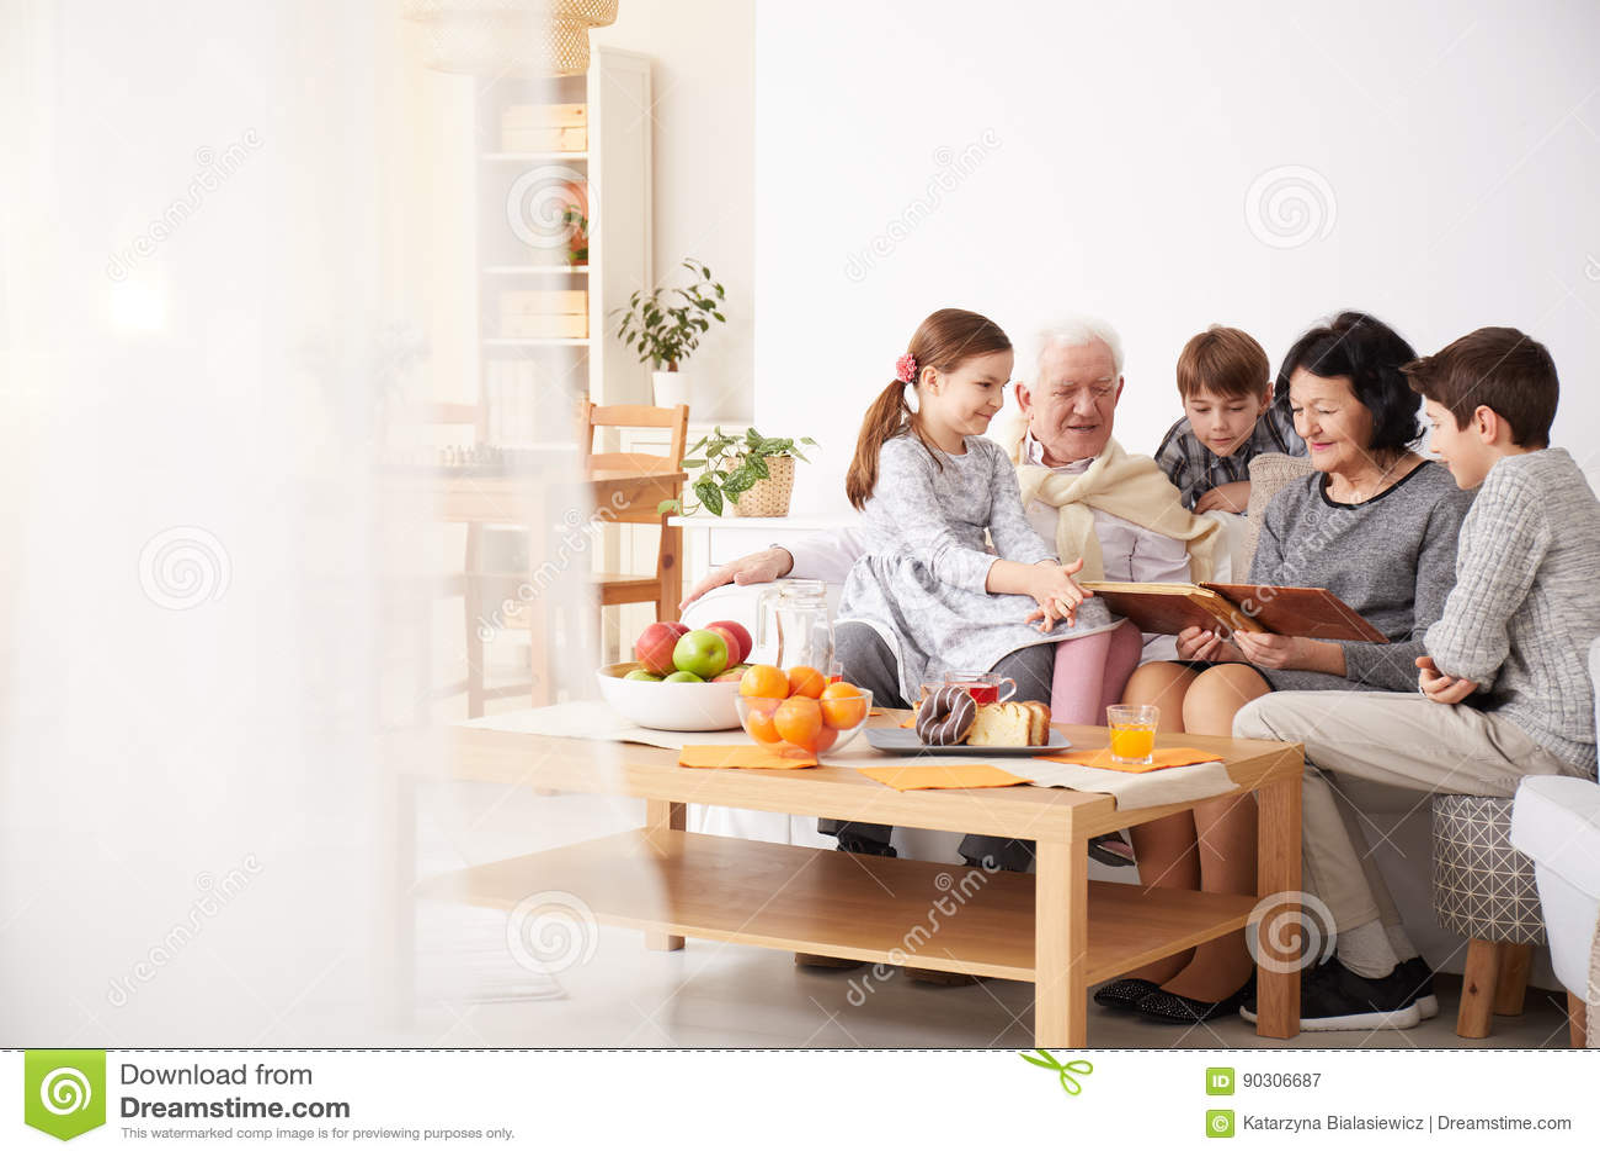 Grandparents showing photo album to their grandchildren